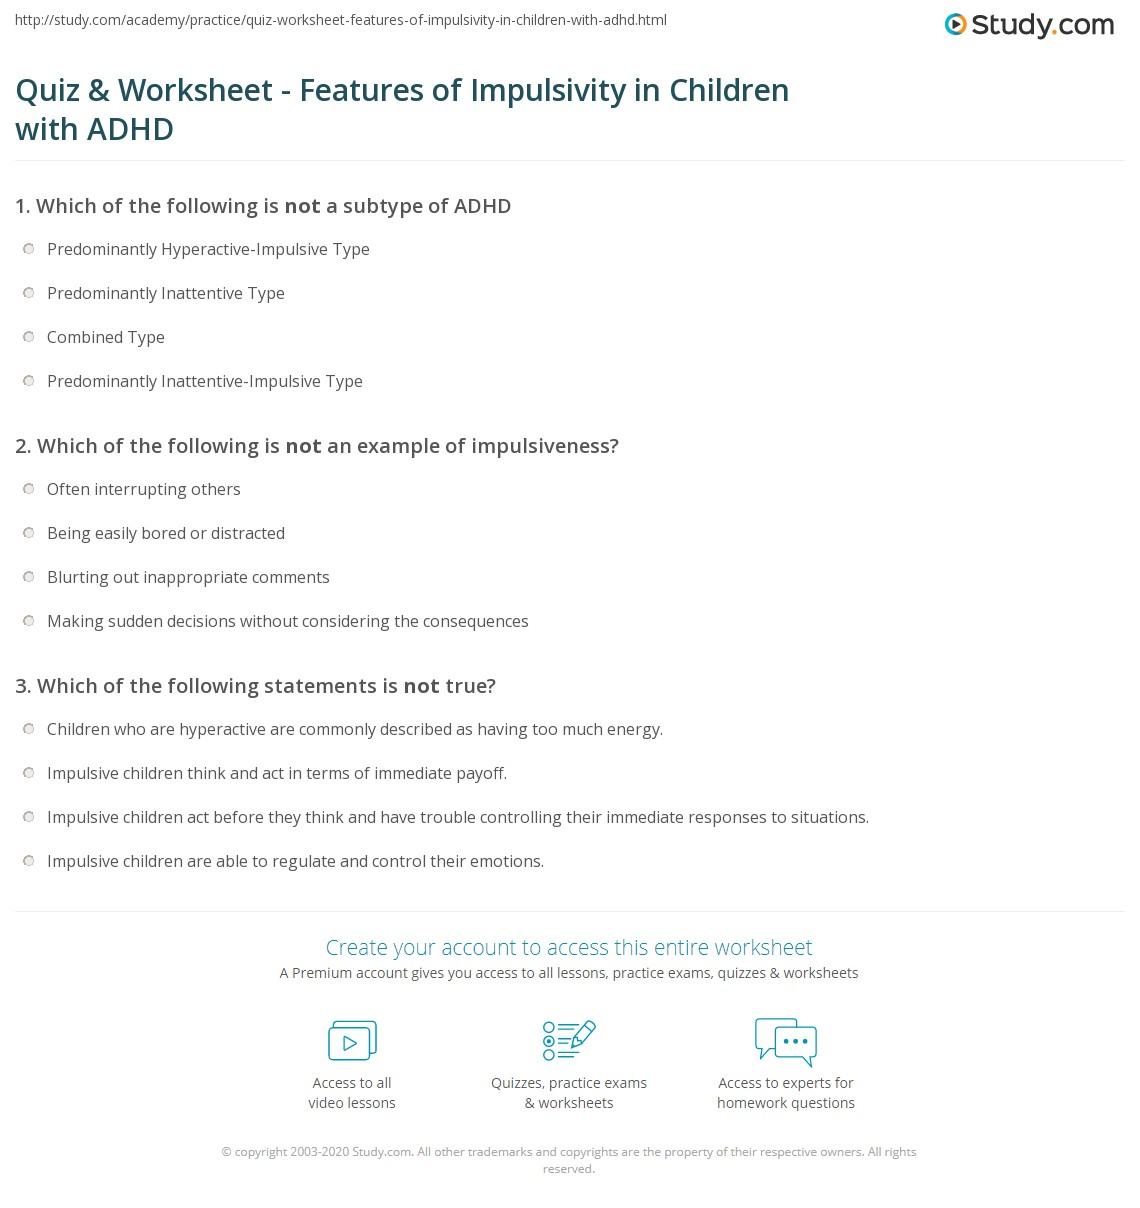 Quiz Worksheet Features Of Impulsivity In Children With Adhd